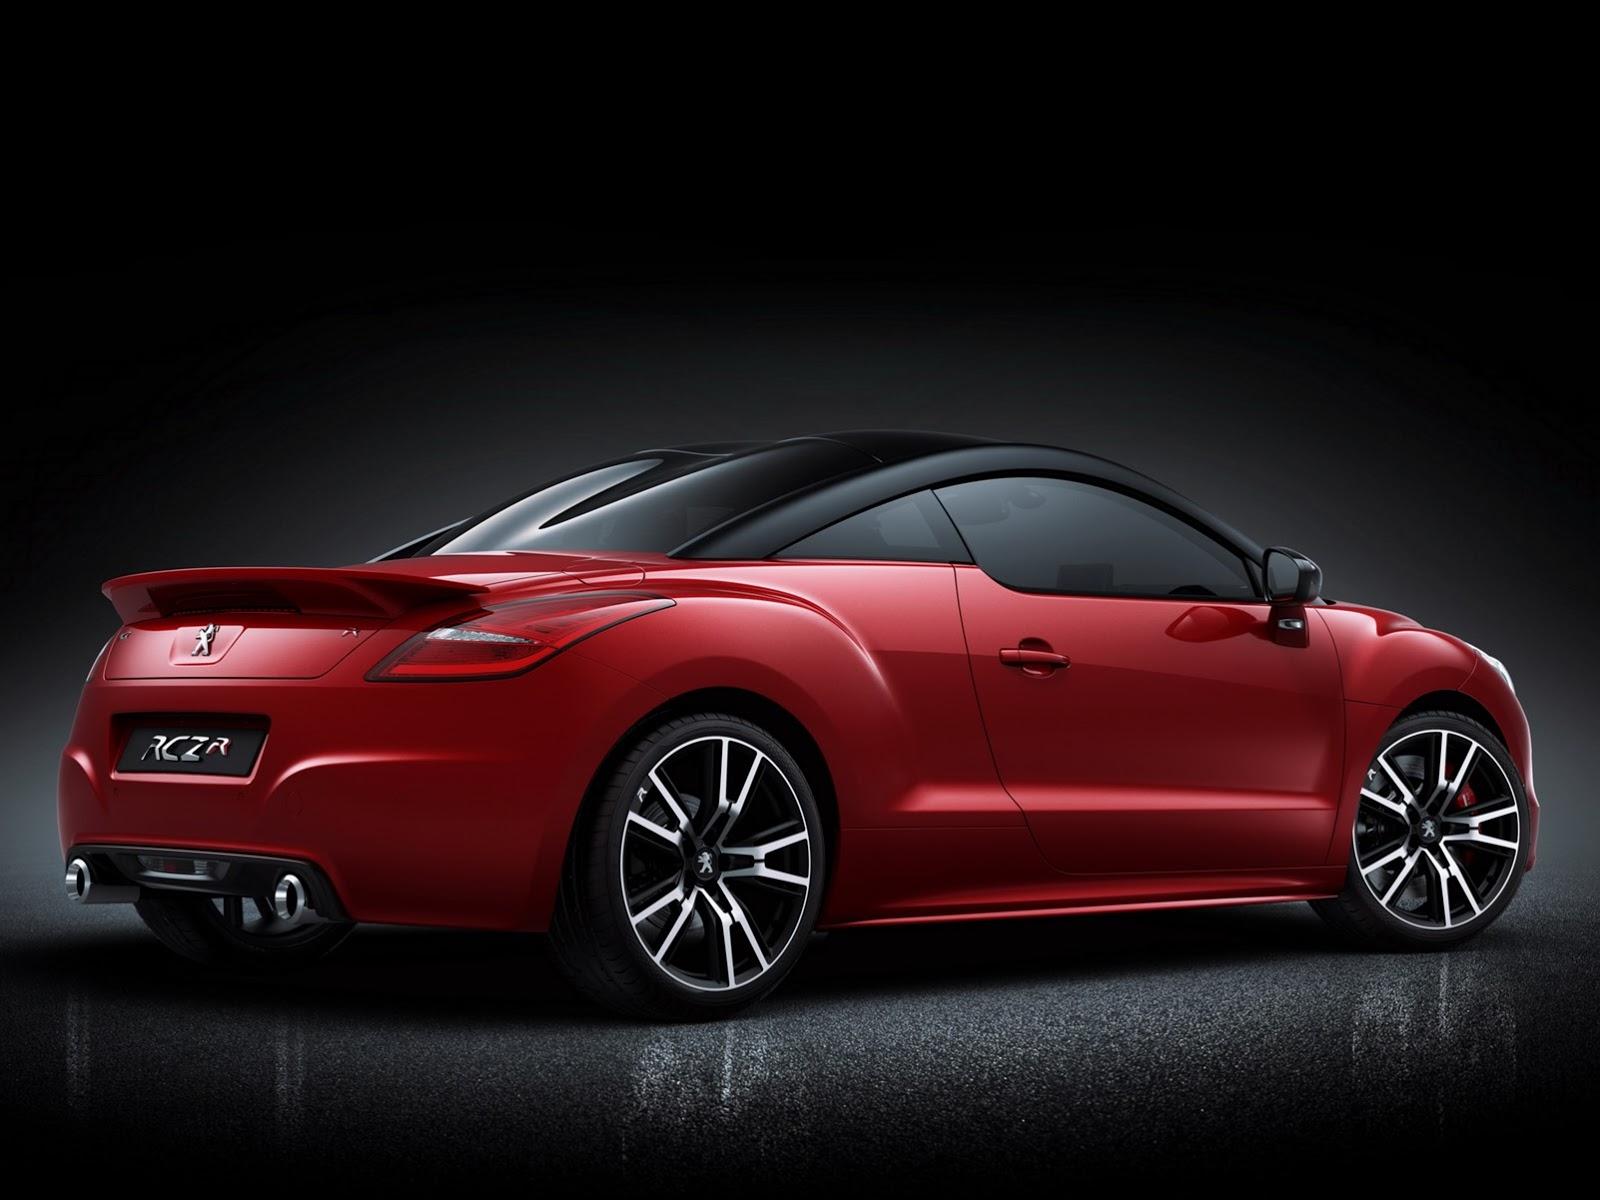 2014-Peugeot-RCZ-R-3%25255B4%25255D.jpg